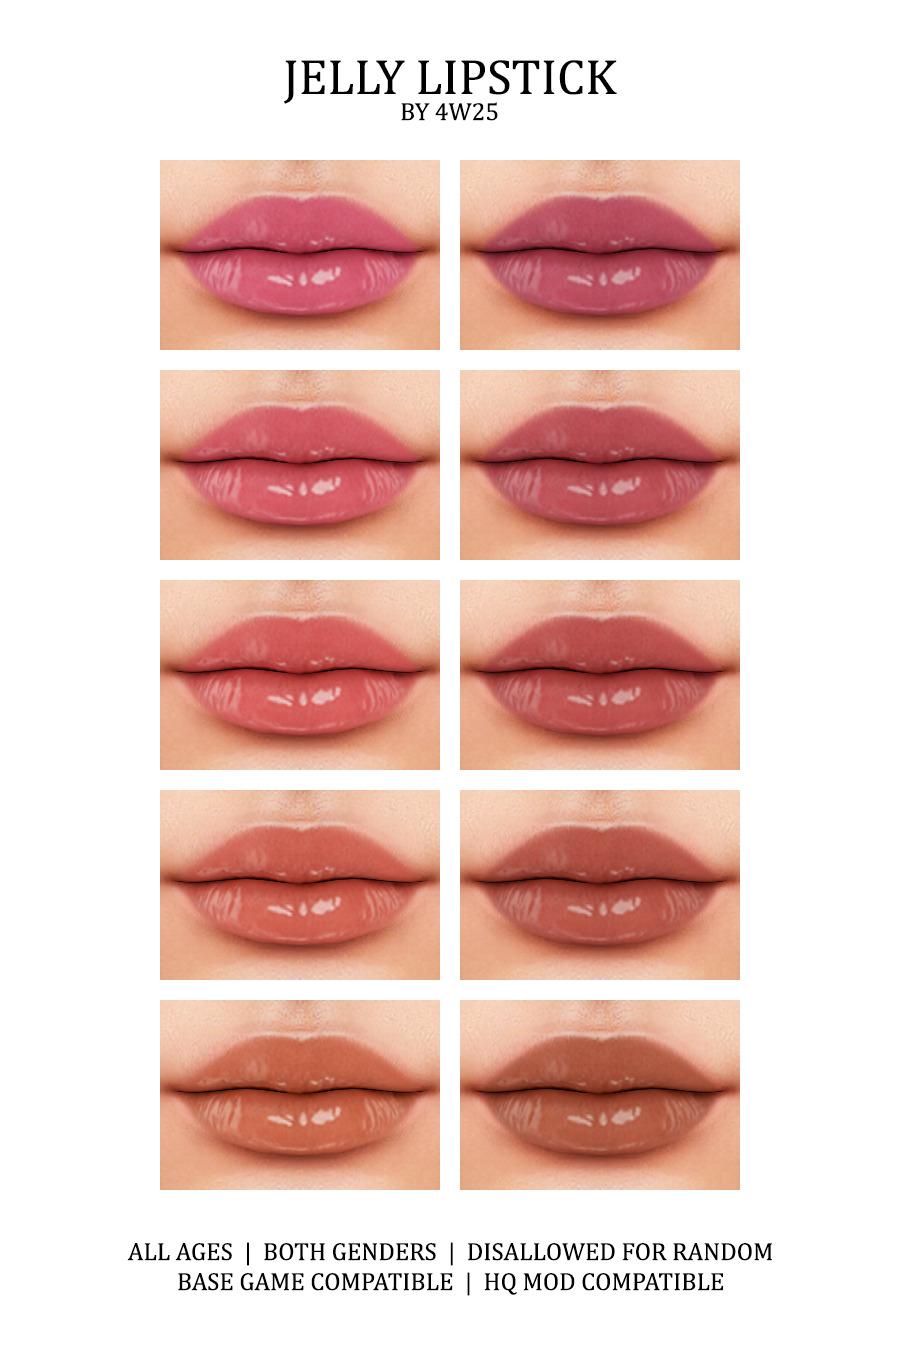 Jelly Lipstick